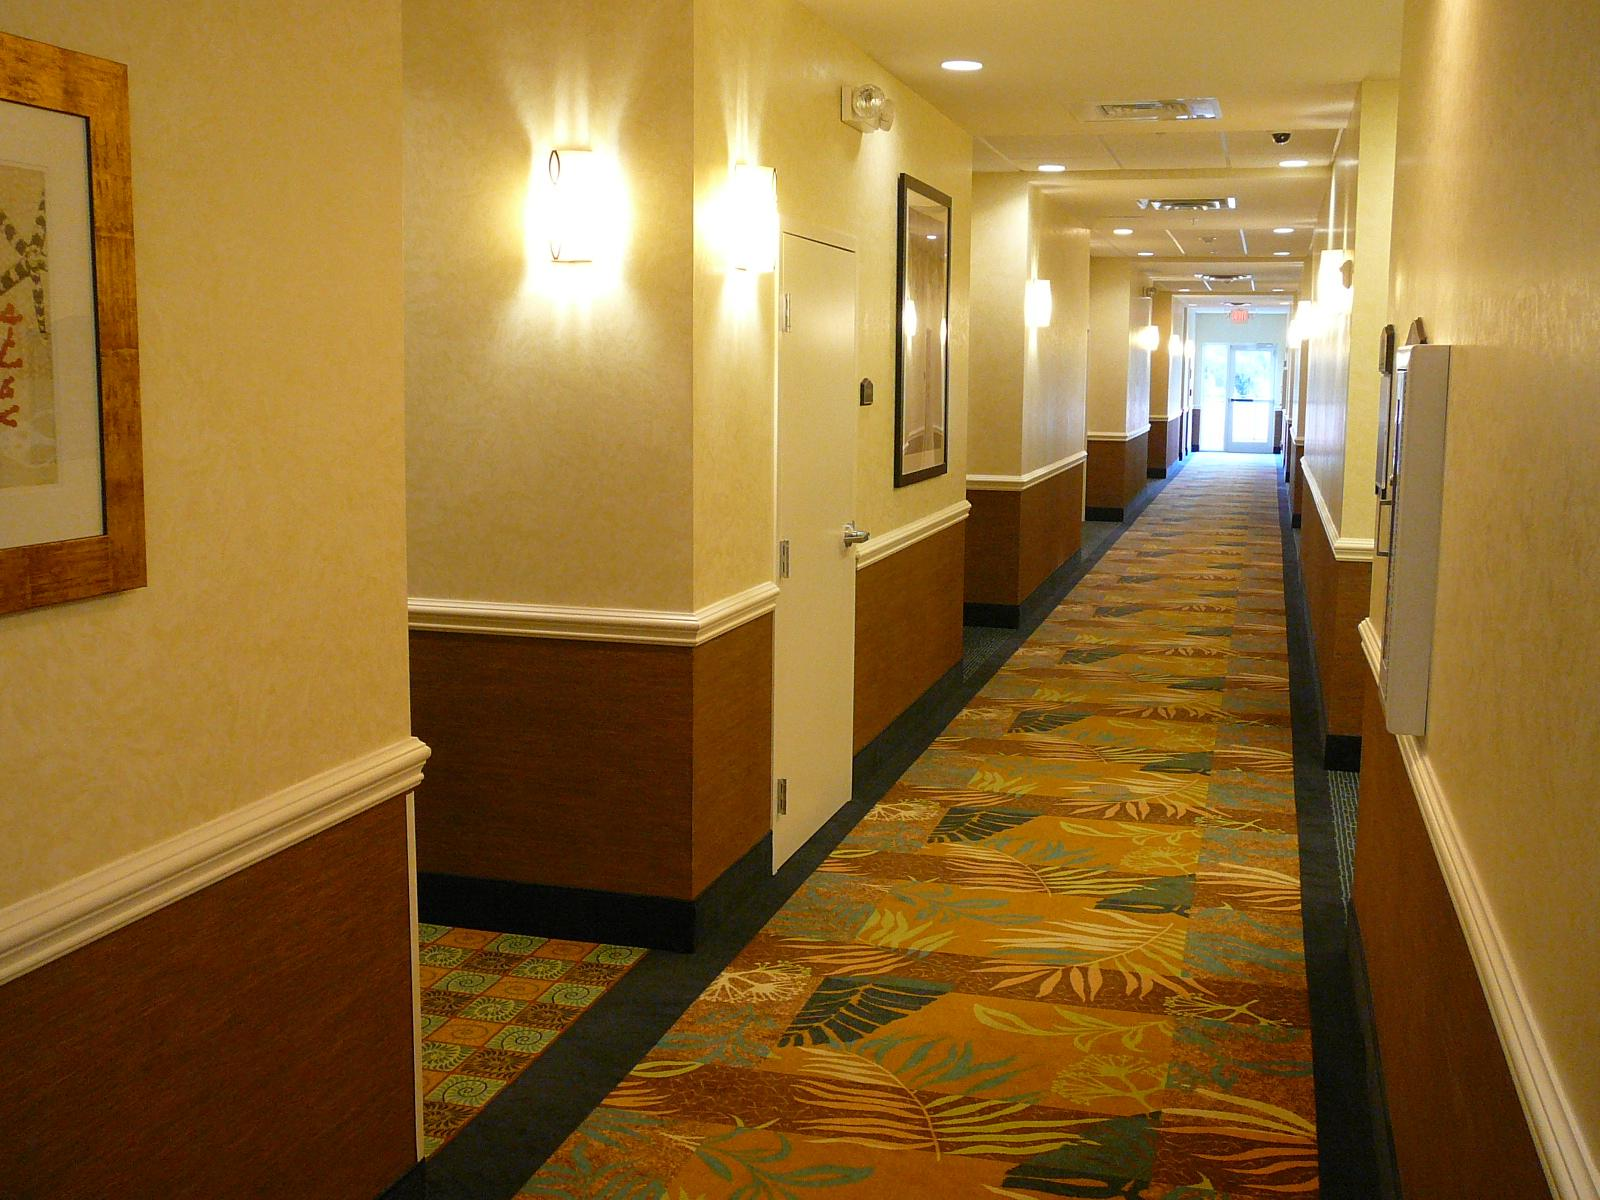 1000 images about corridor design on pinterest for Hotel corridor decor